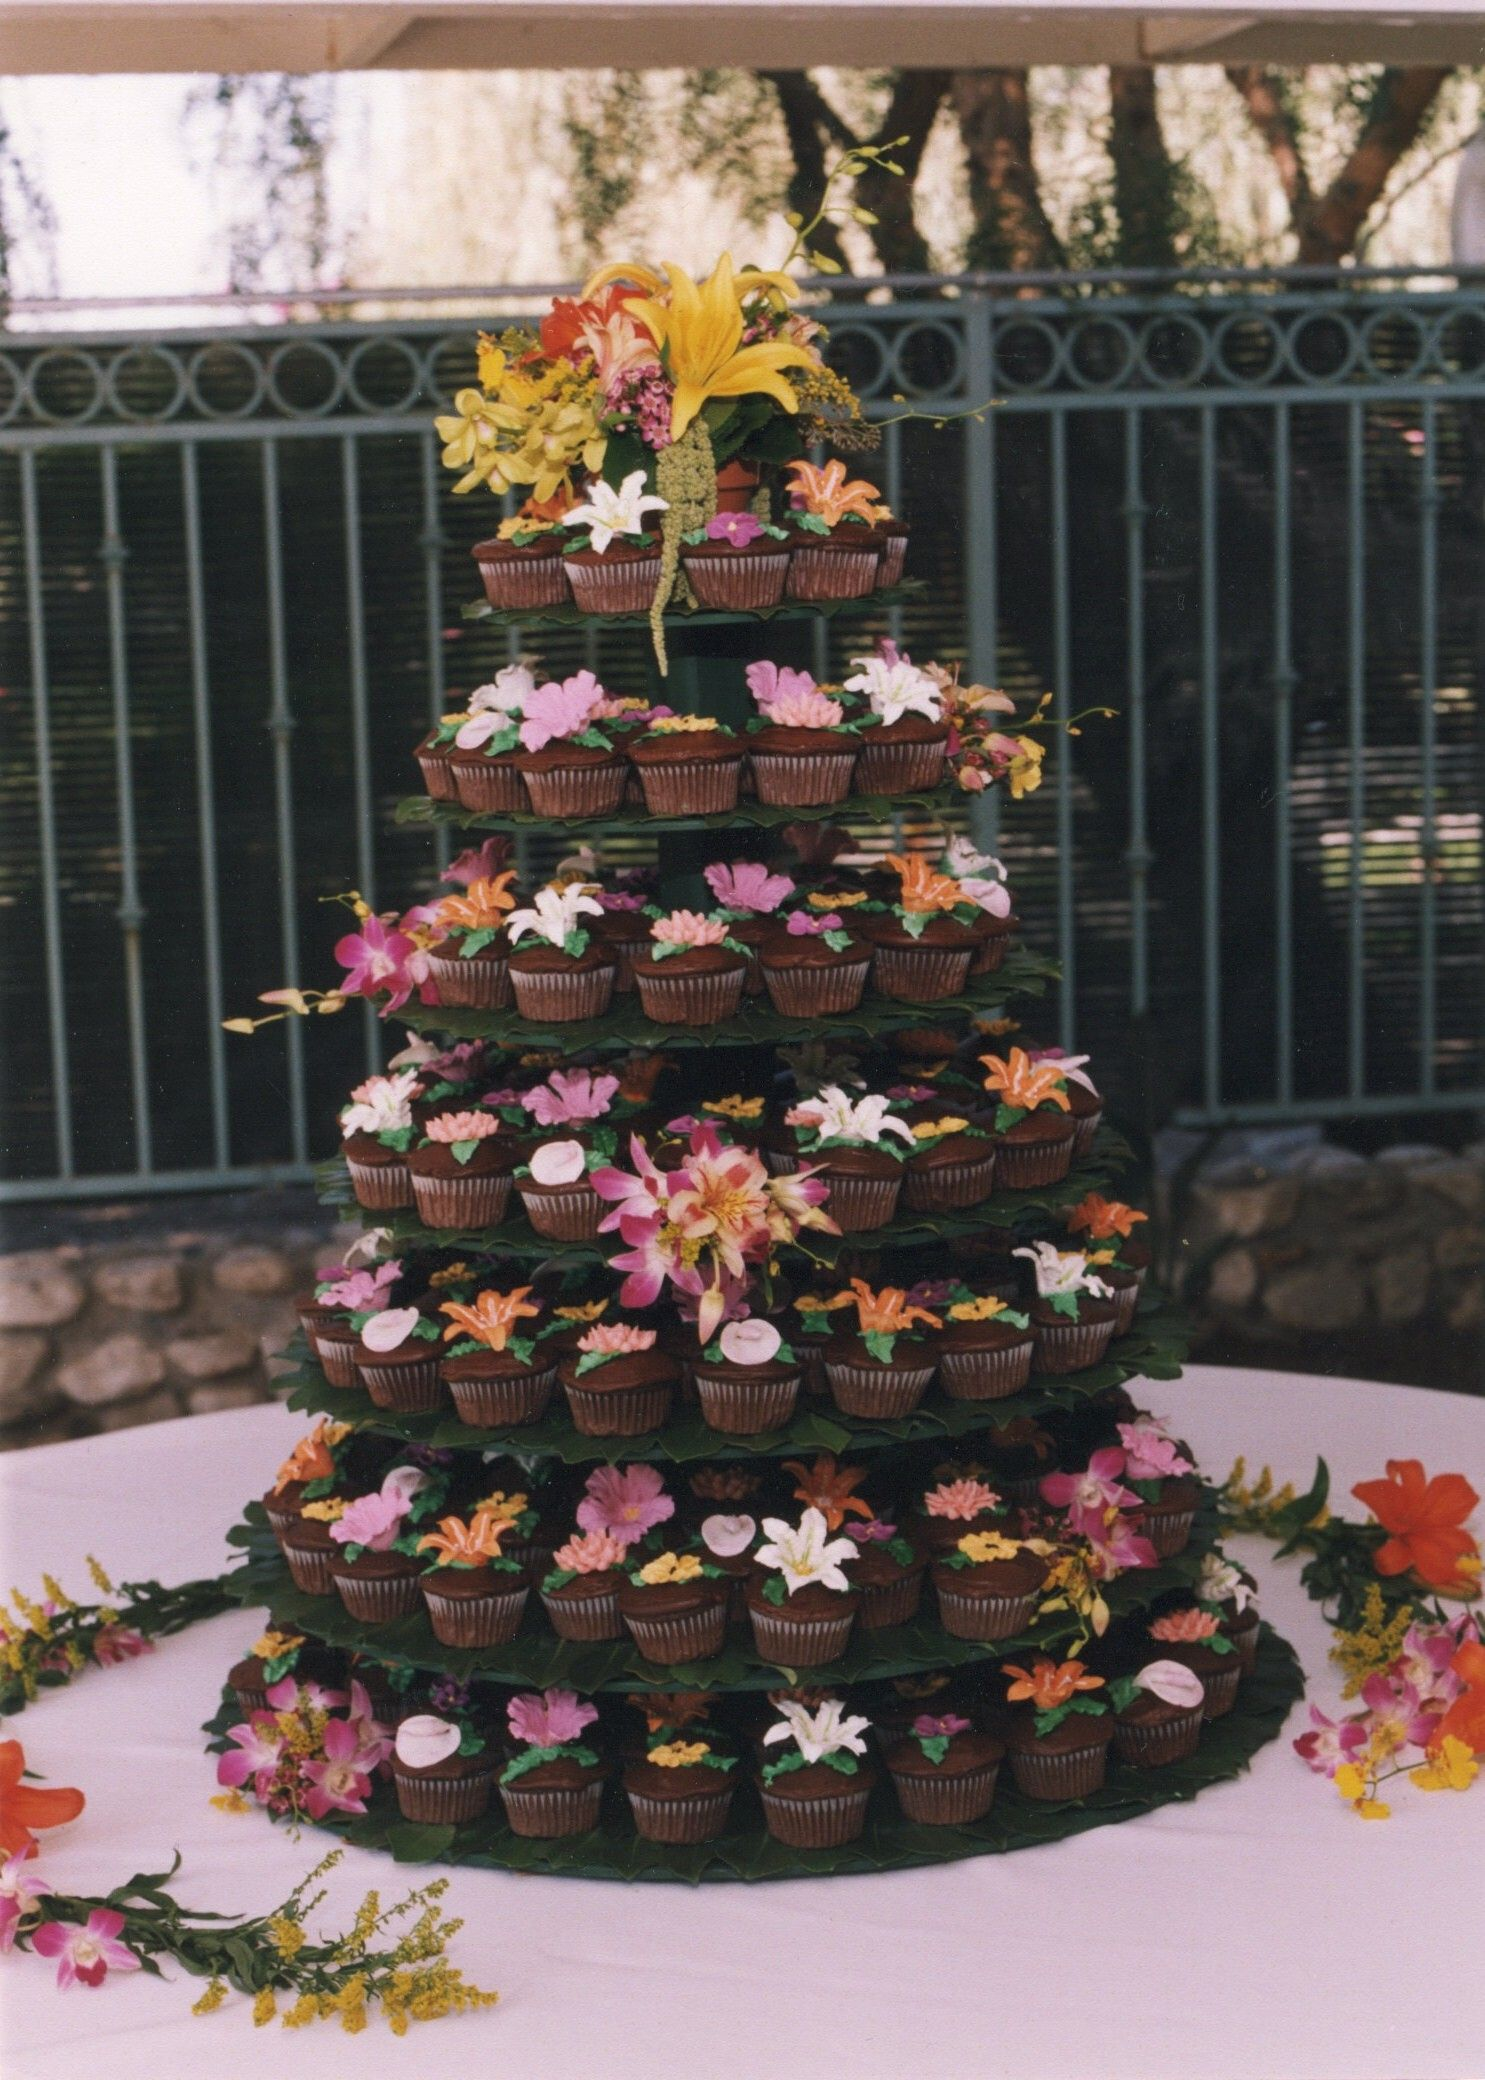 Cupcake Wedding Cake For A Hawaiian Themed Wedding My Cakes